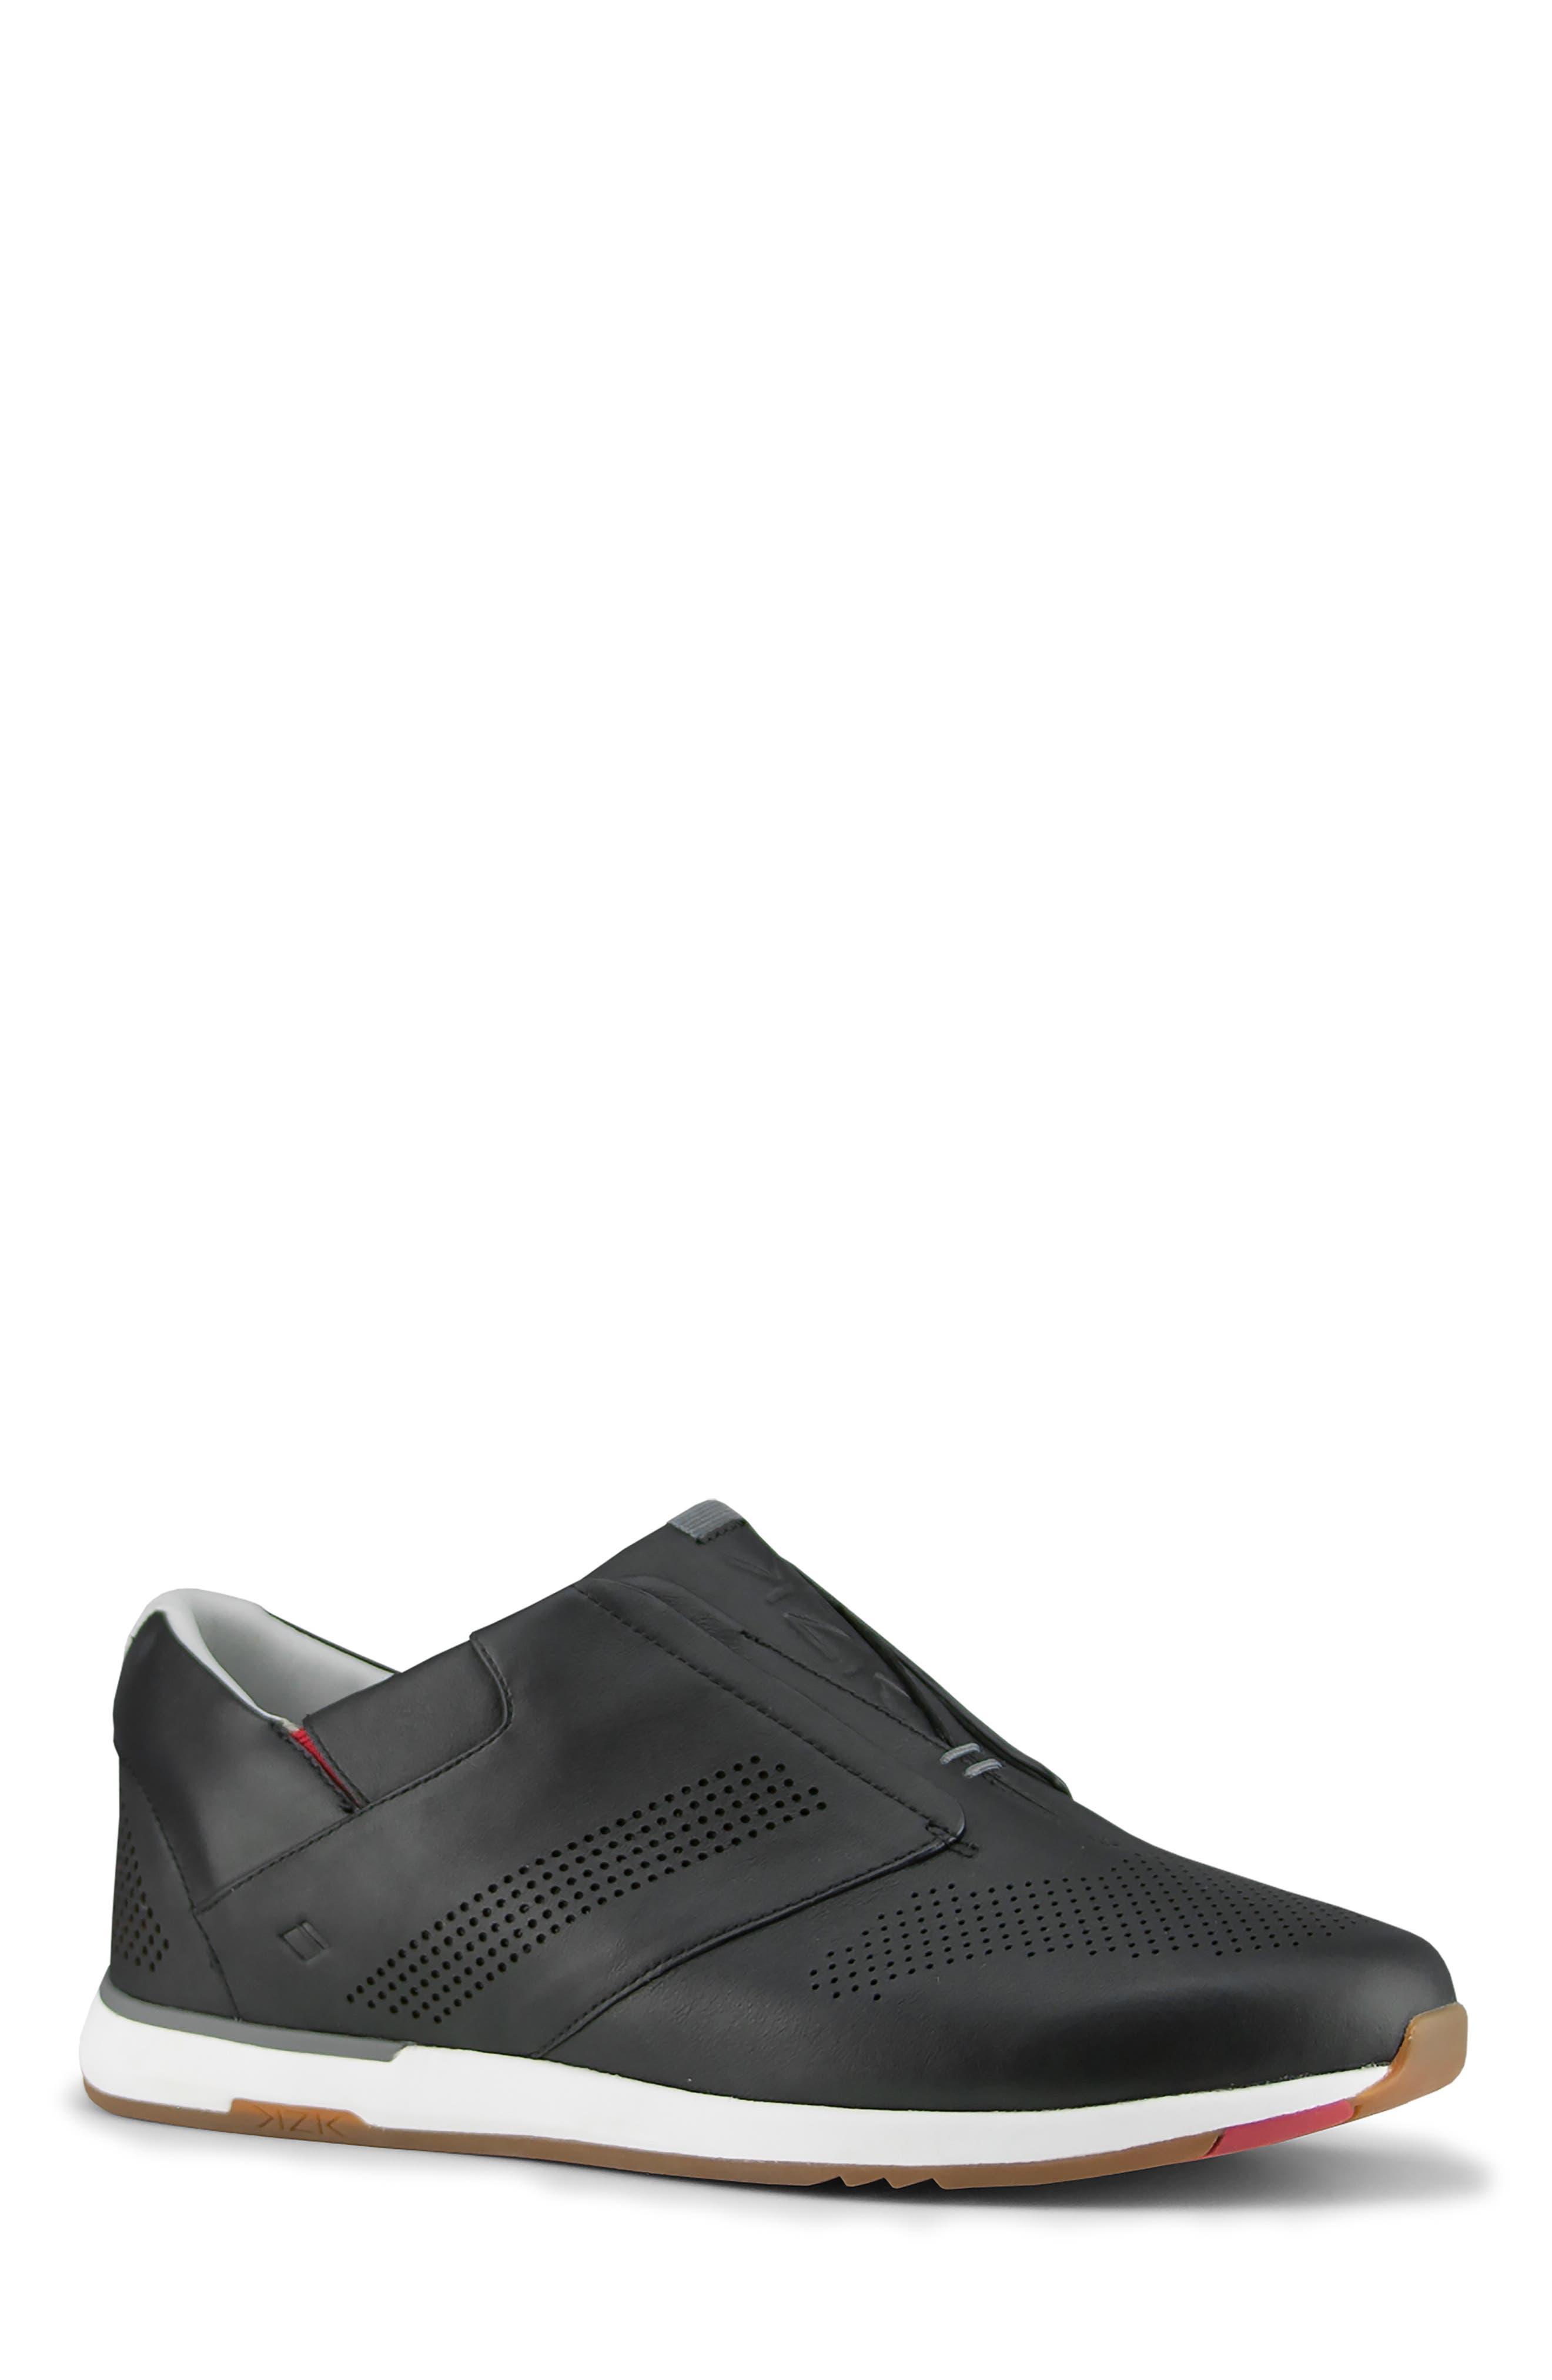 Kizik Dubai Slip-On Sneaker, Black